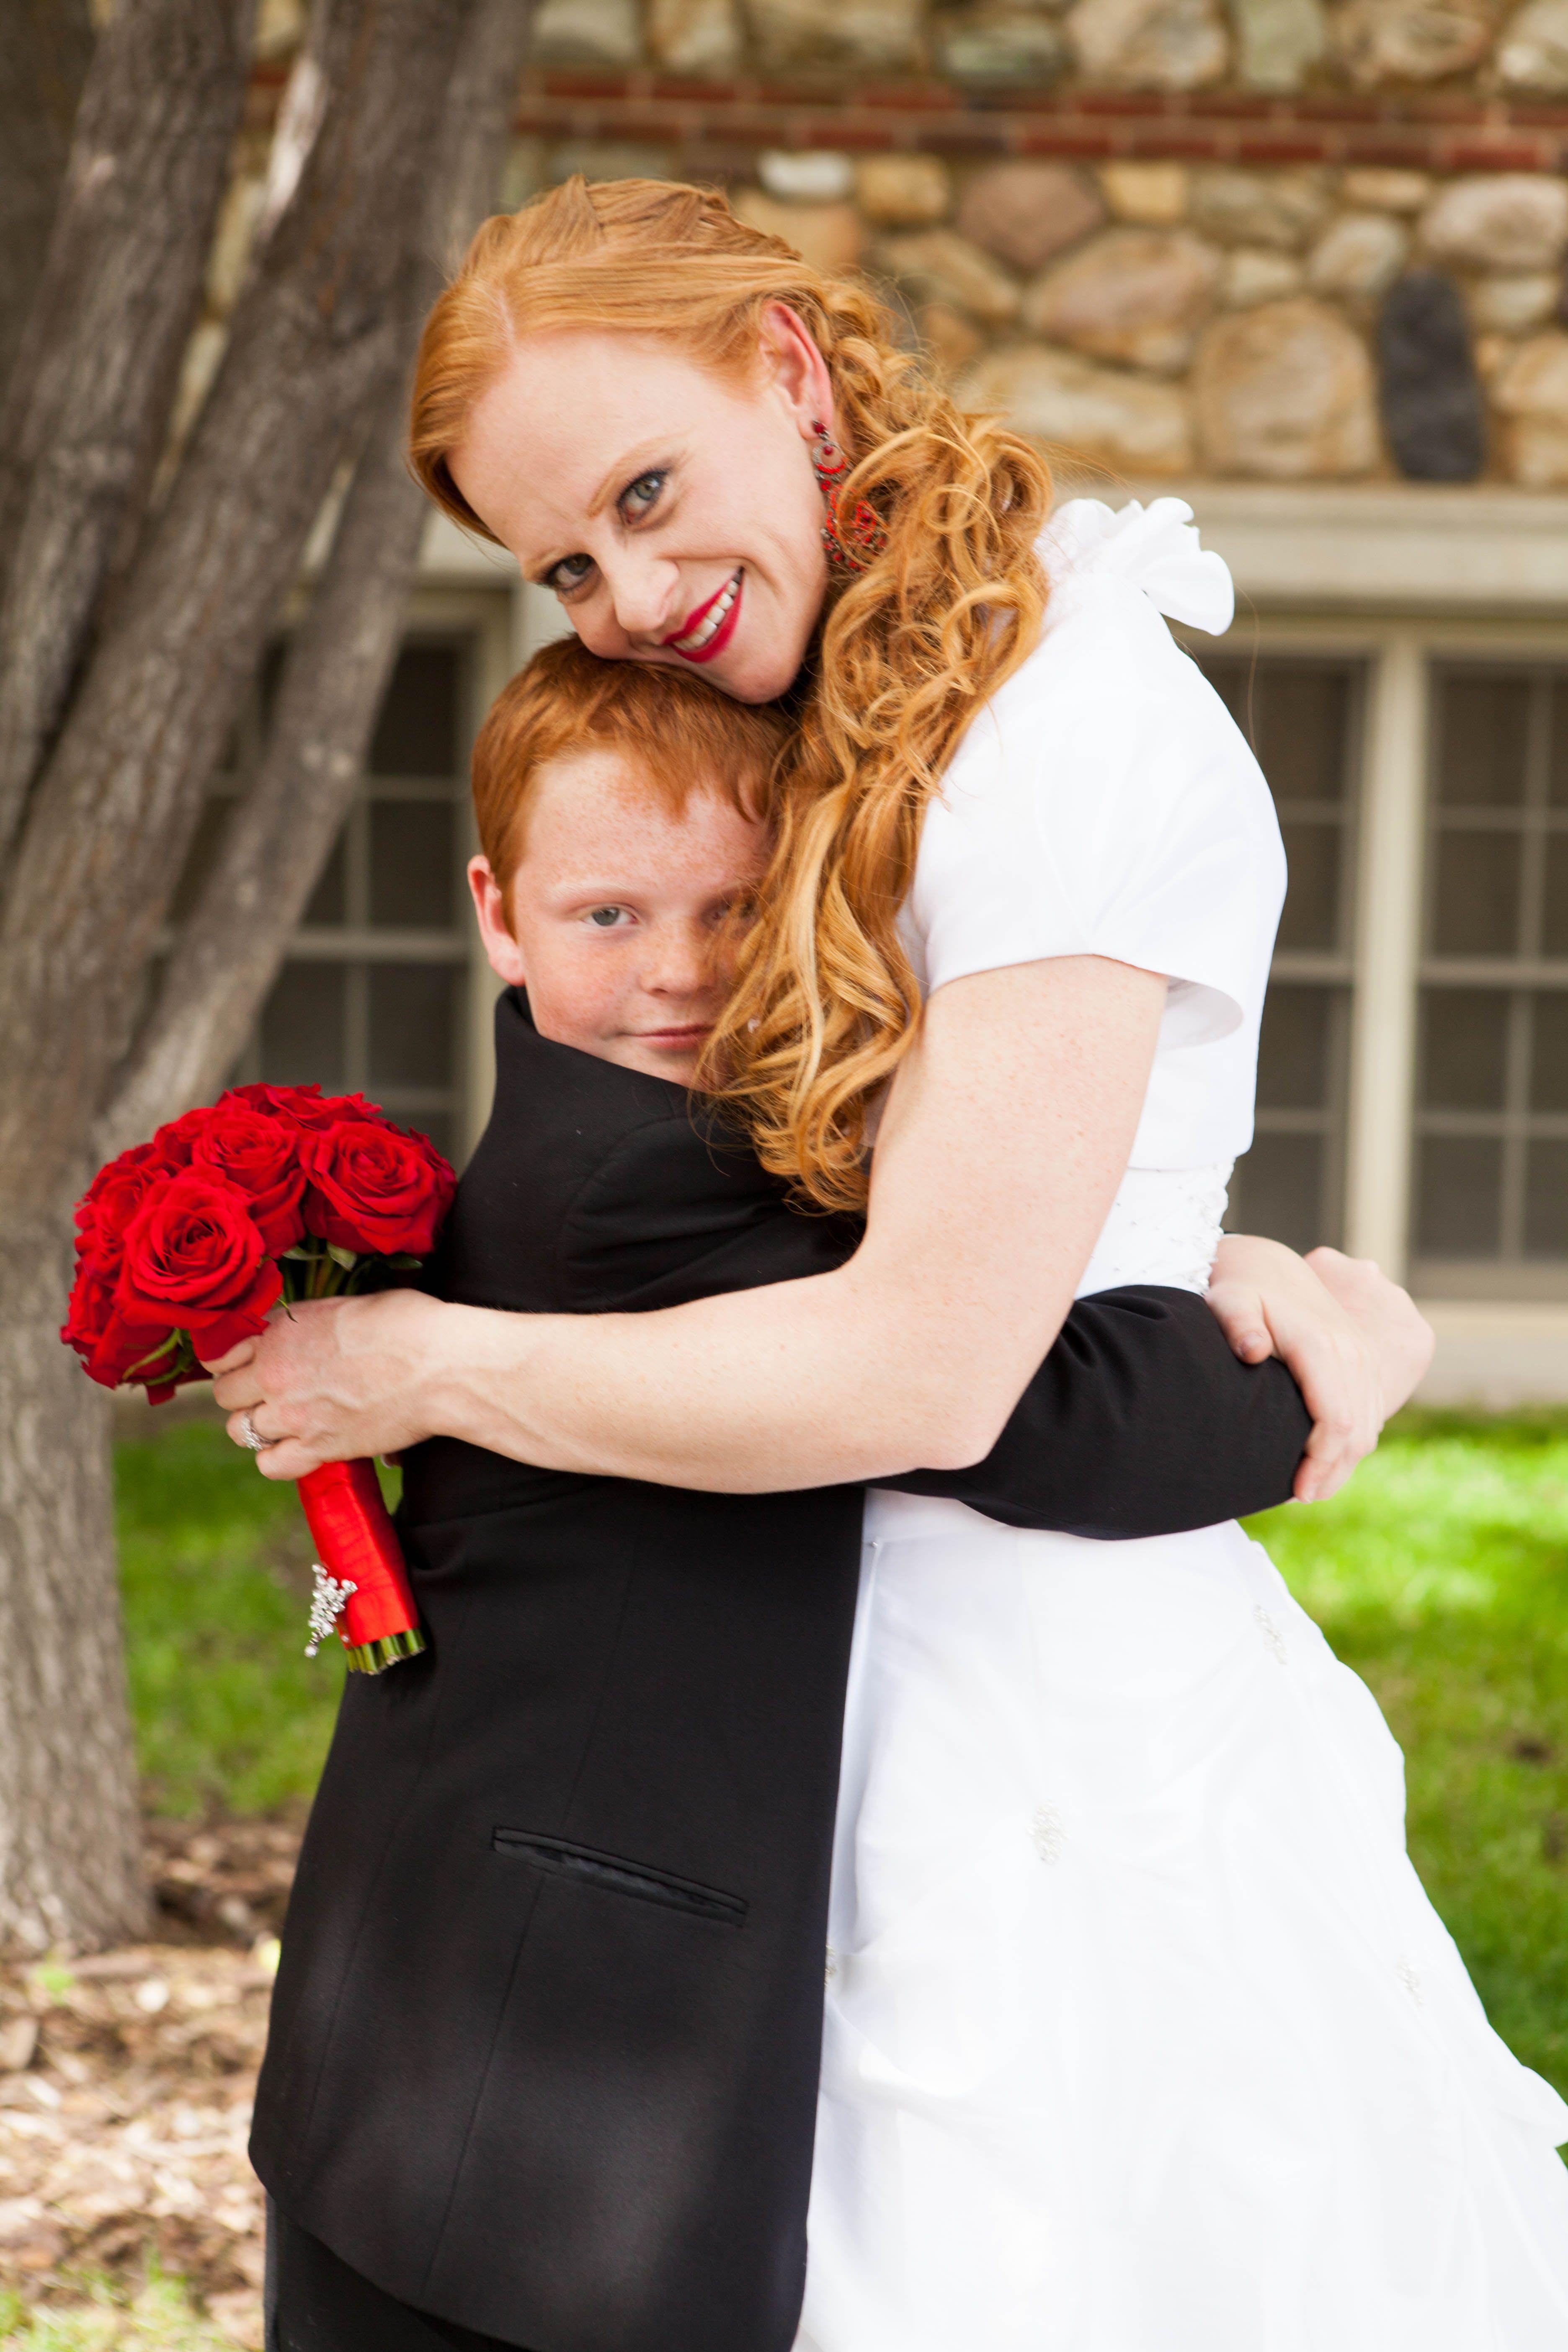 Bellas wedding dress  Heart Melt Photography by Pearl Pixels  My Dream Wedding  Pinterest